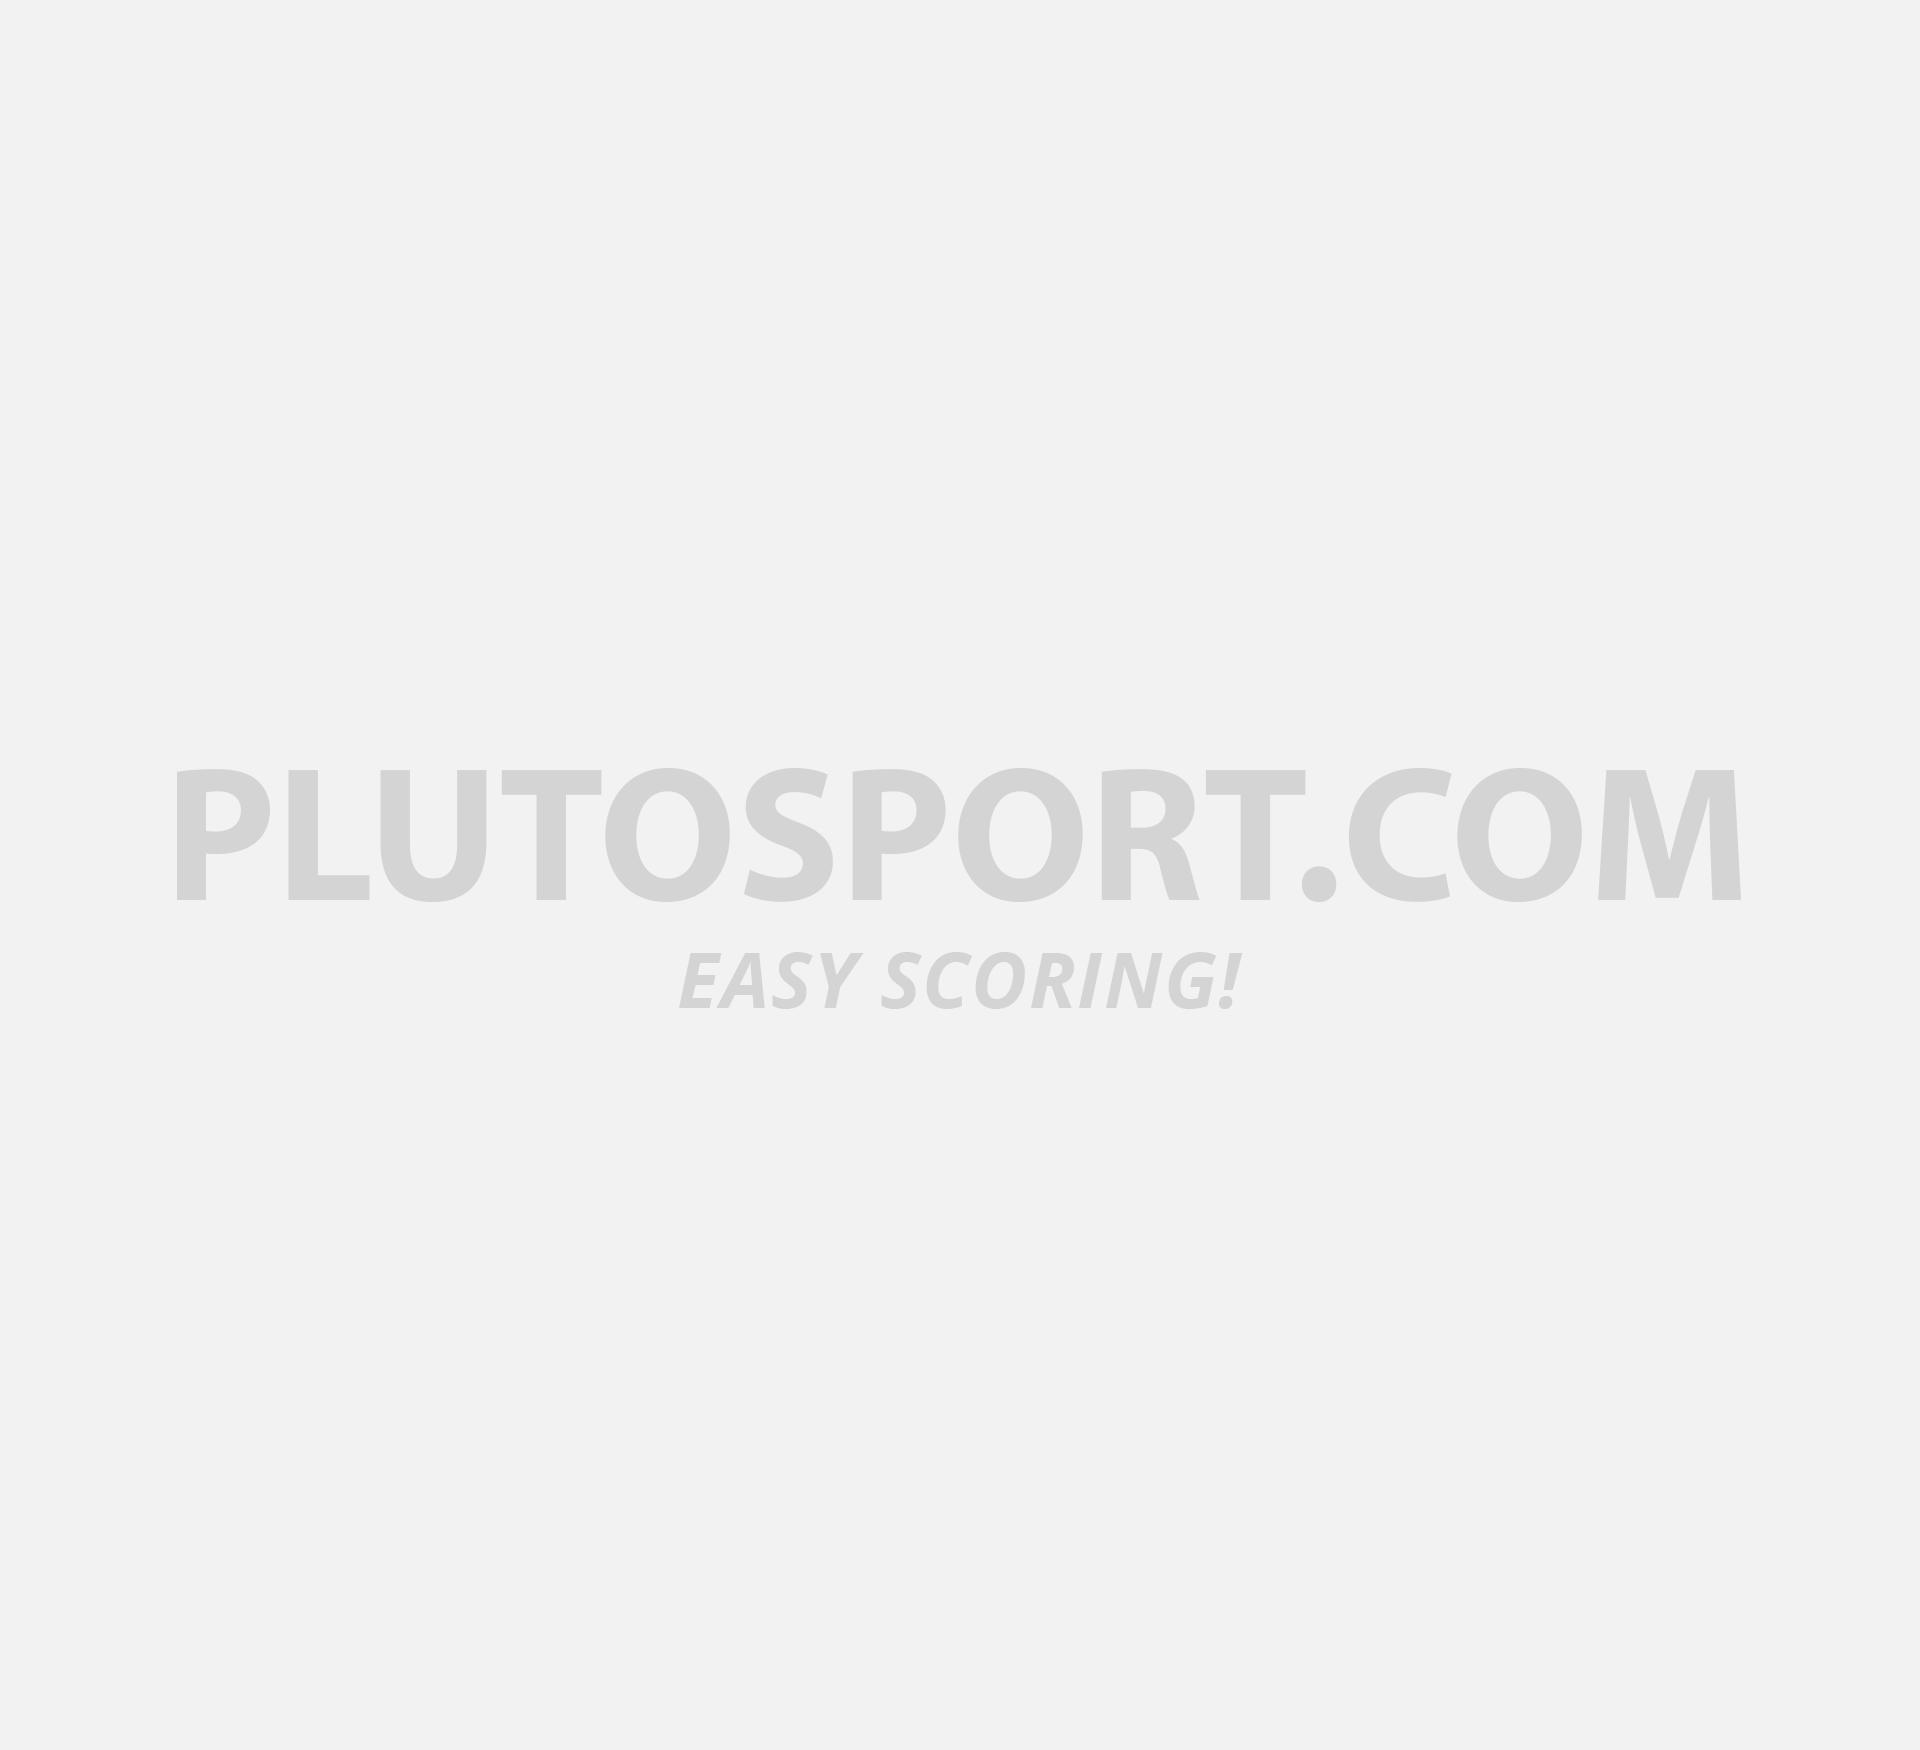 low priced 78e99 89246 Adidas Falcon Elite 5 xj - Neutral - Shoes - Running - Sports   Plutosport